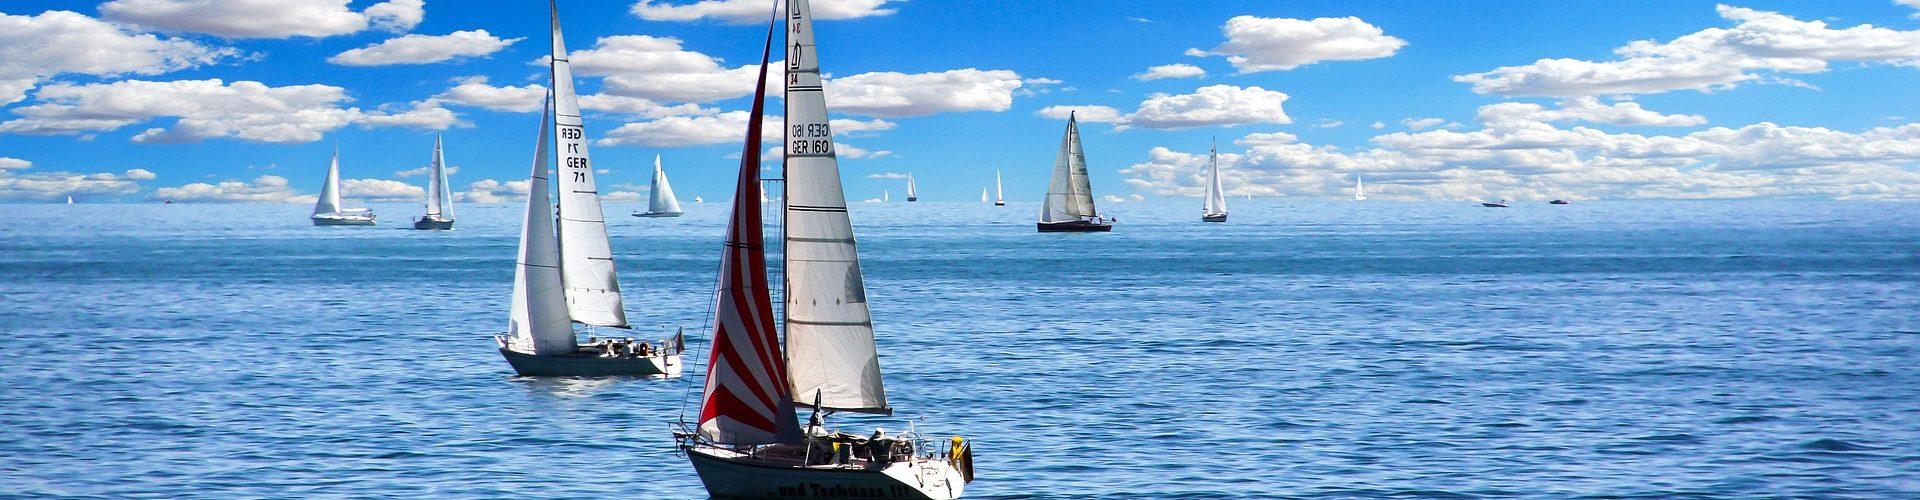 segeln lernen in Wittmund Carolinensiel segelschein machen in Wittmund Carolinensiel 1920x500 - Segeln lernen in Wittmund Carolinensiel